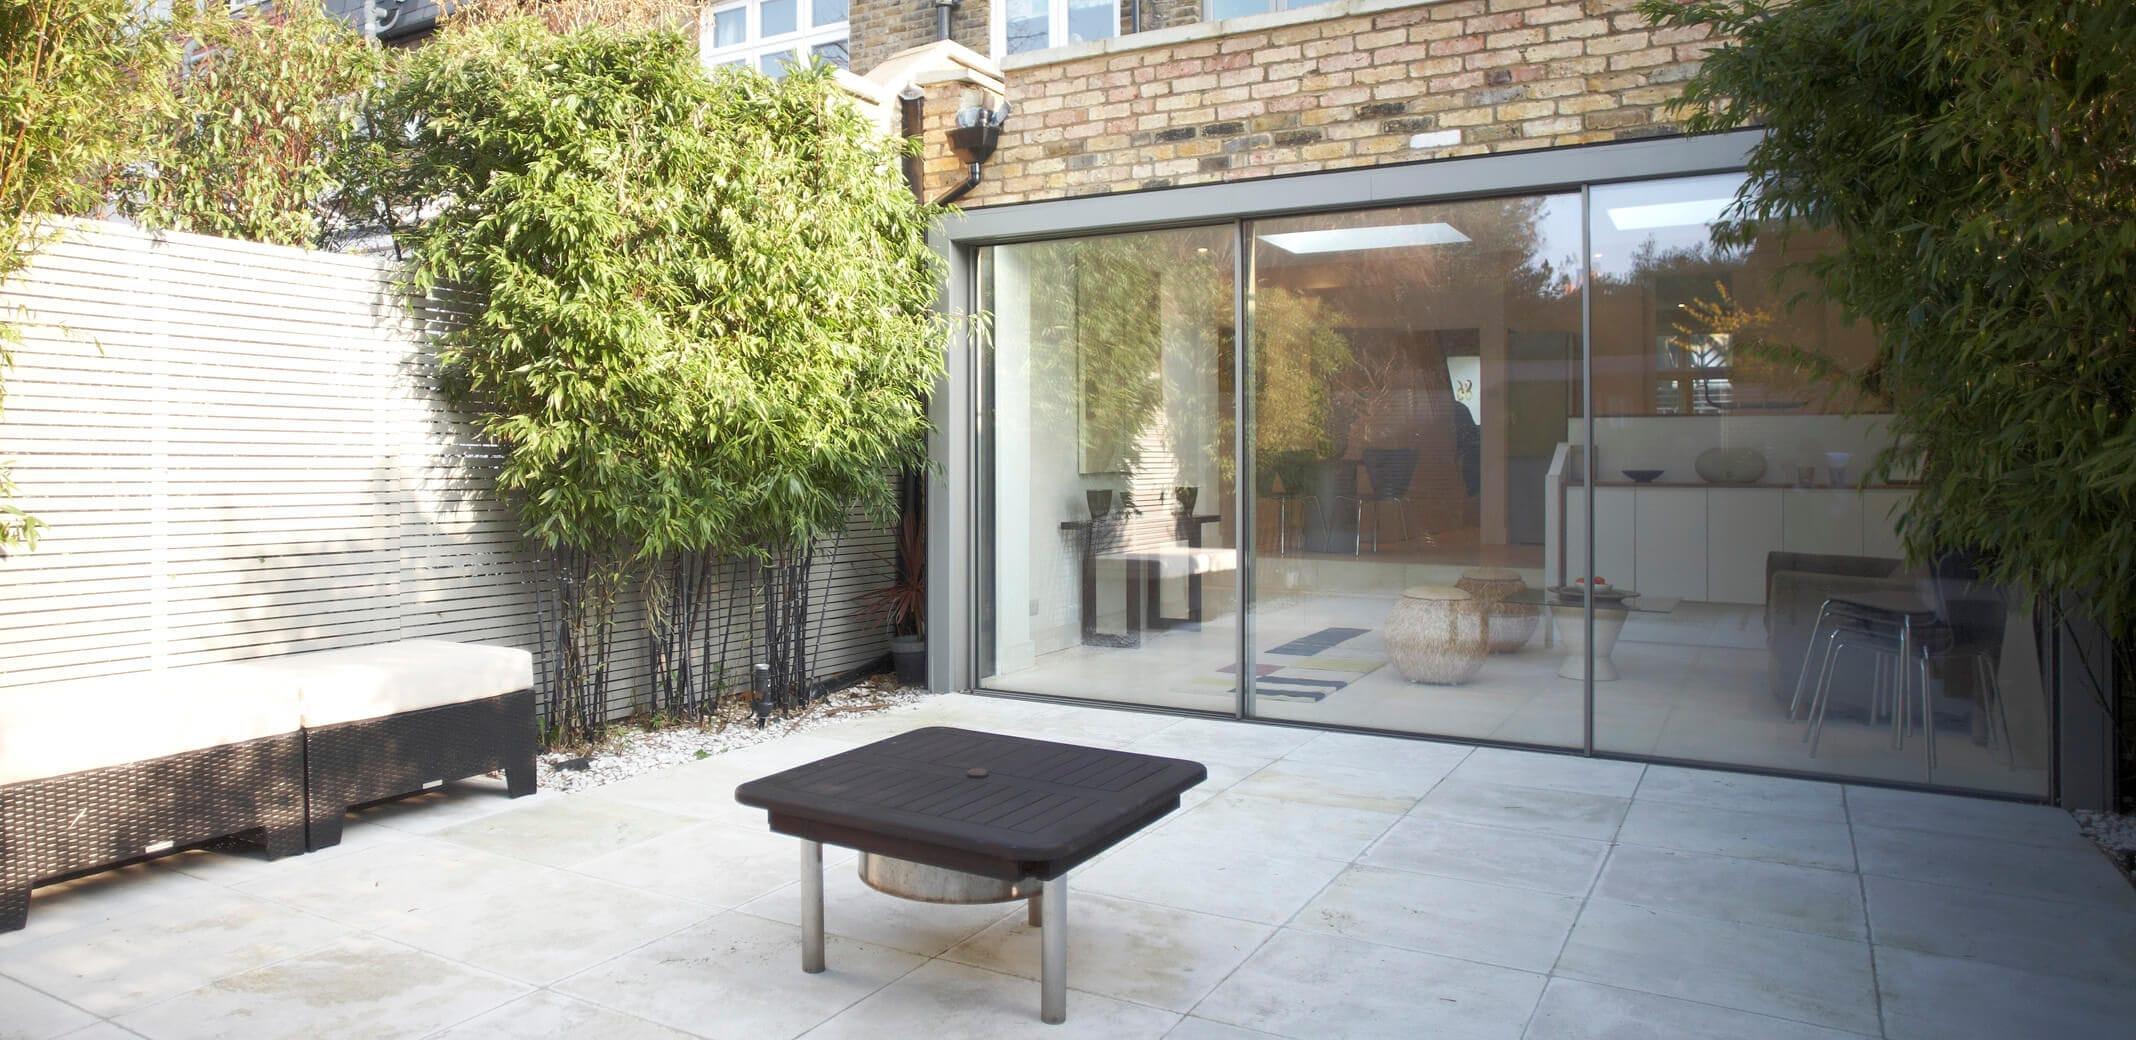 Sliding patio door metal double glazed SKY FRAME CLASSIC